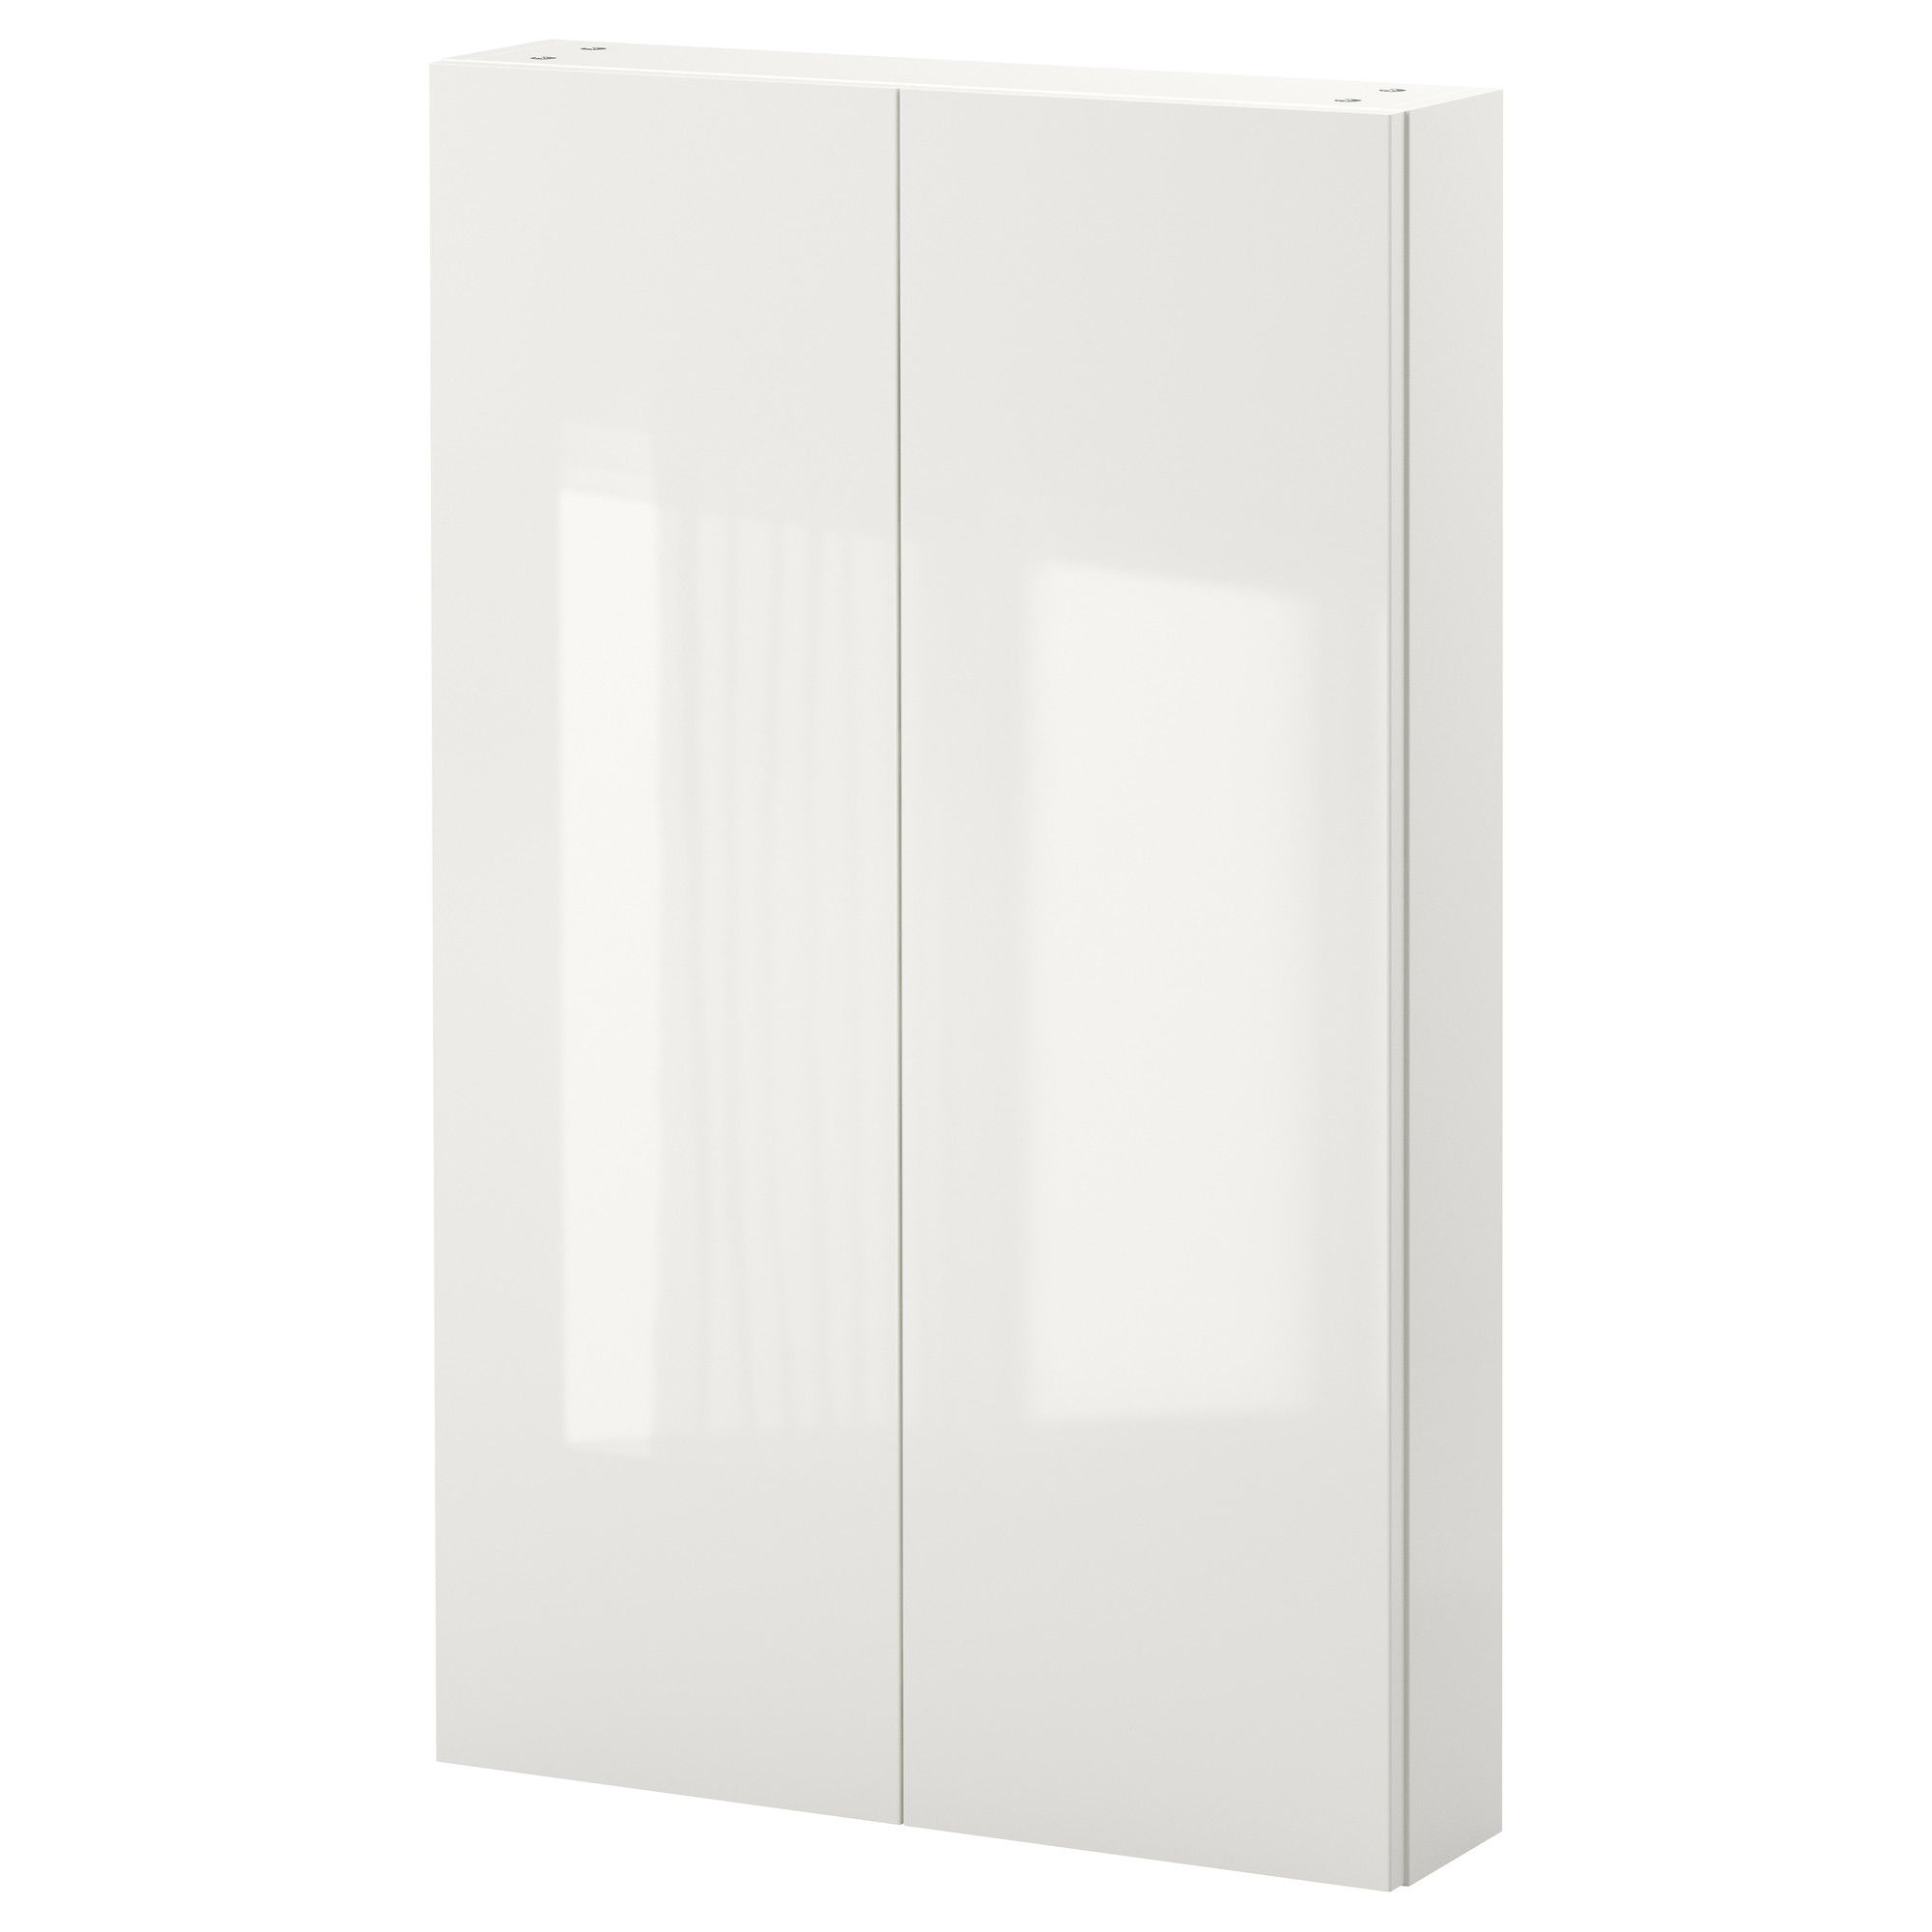 Godmorgon armario de pared con 2 puertas alto brillo for Armario de pared con entrada equipada